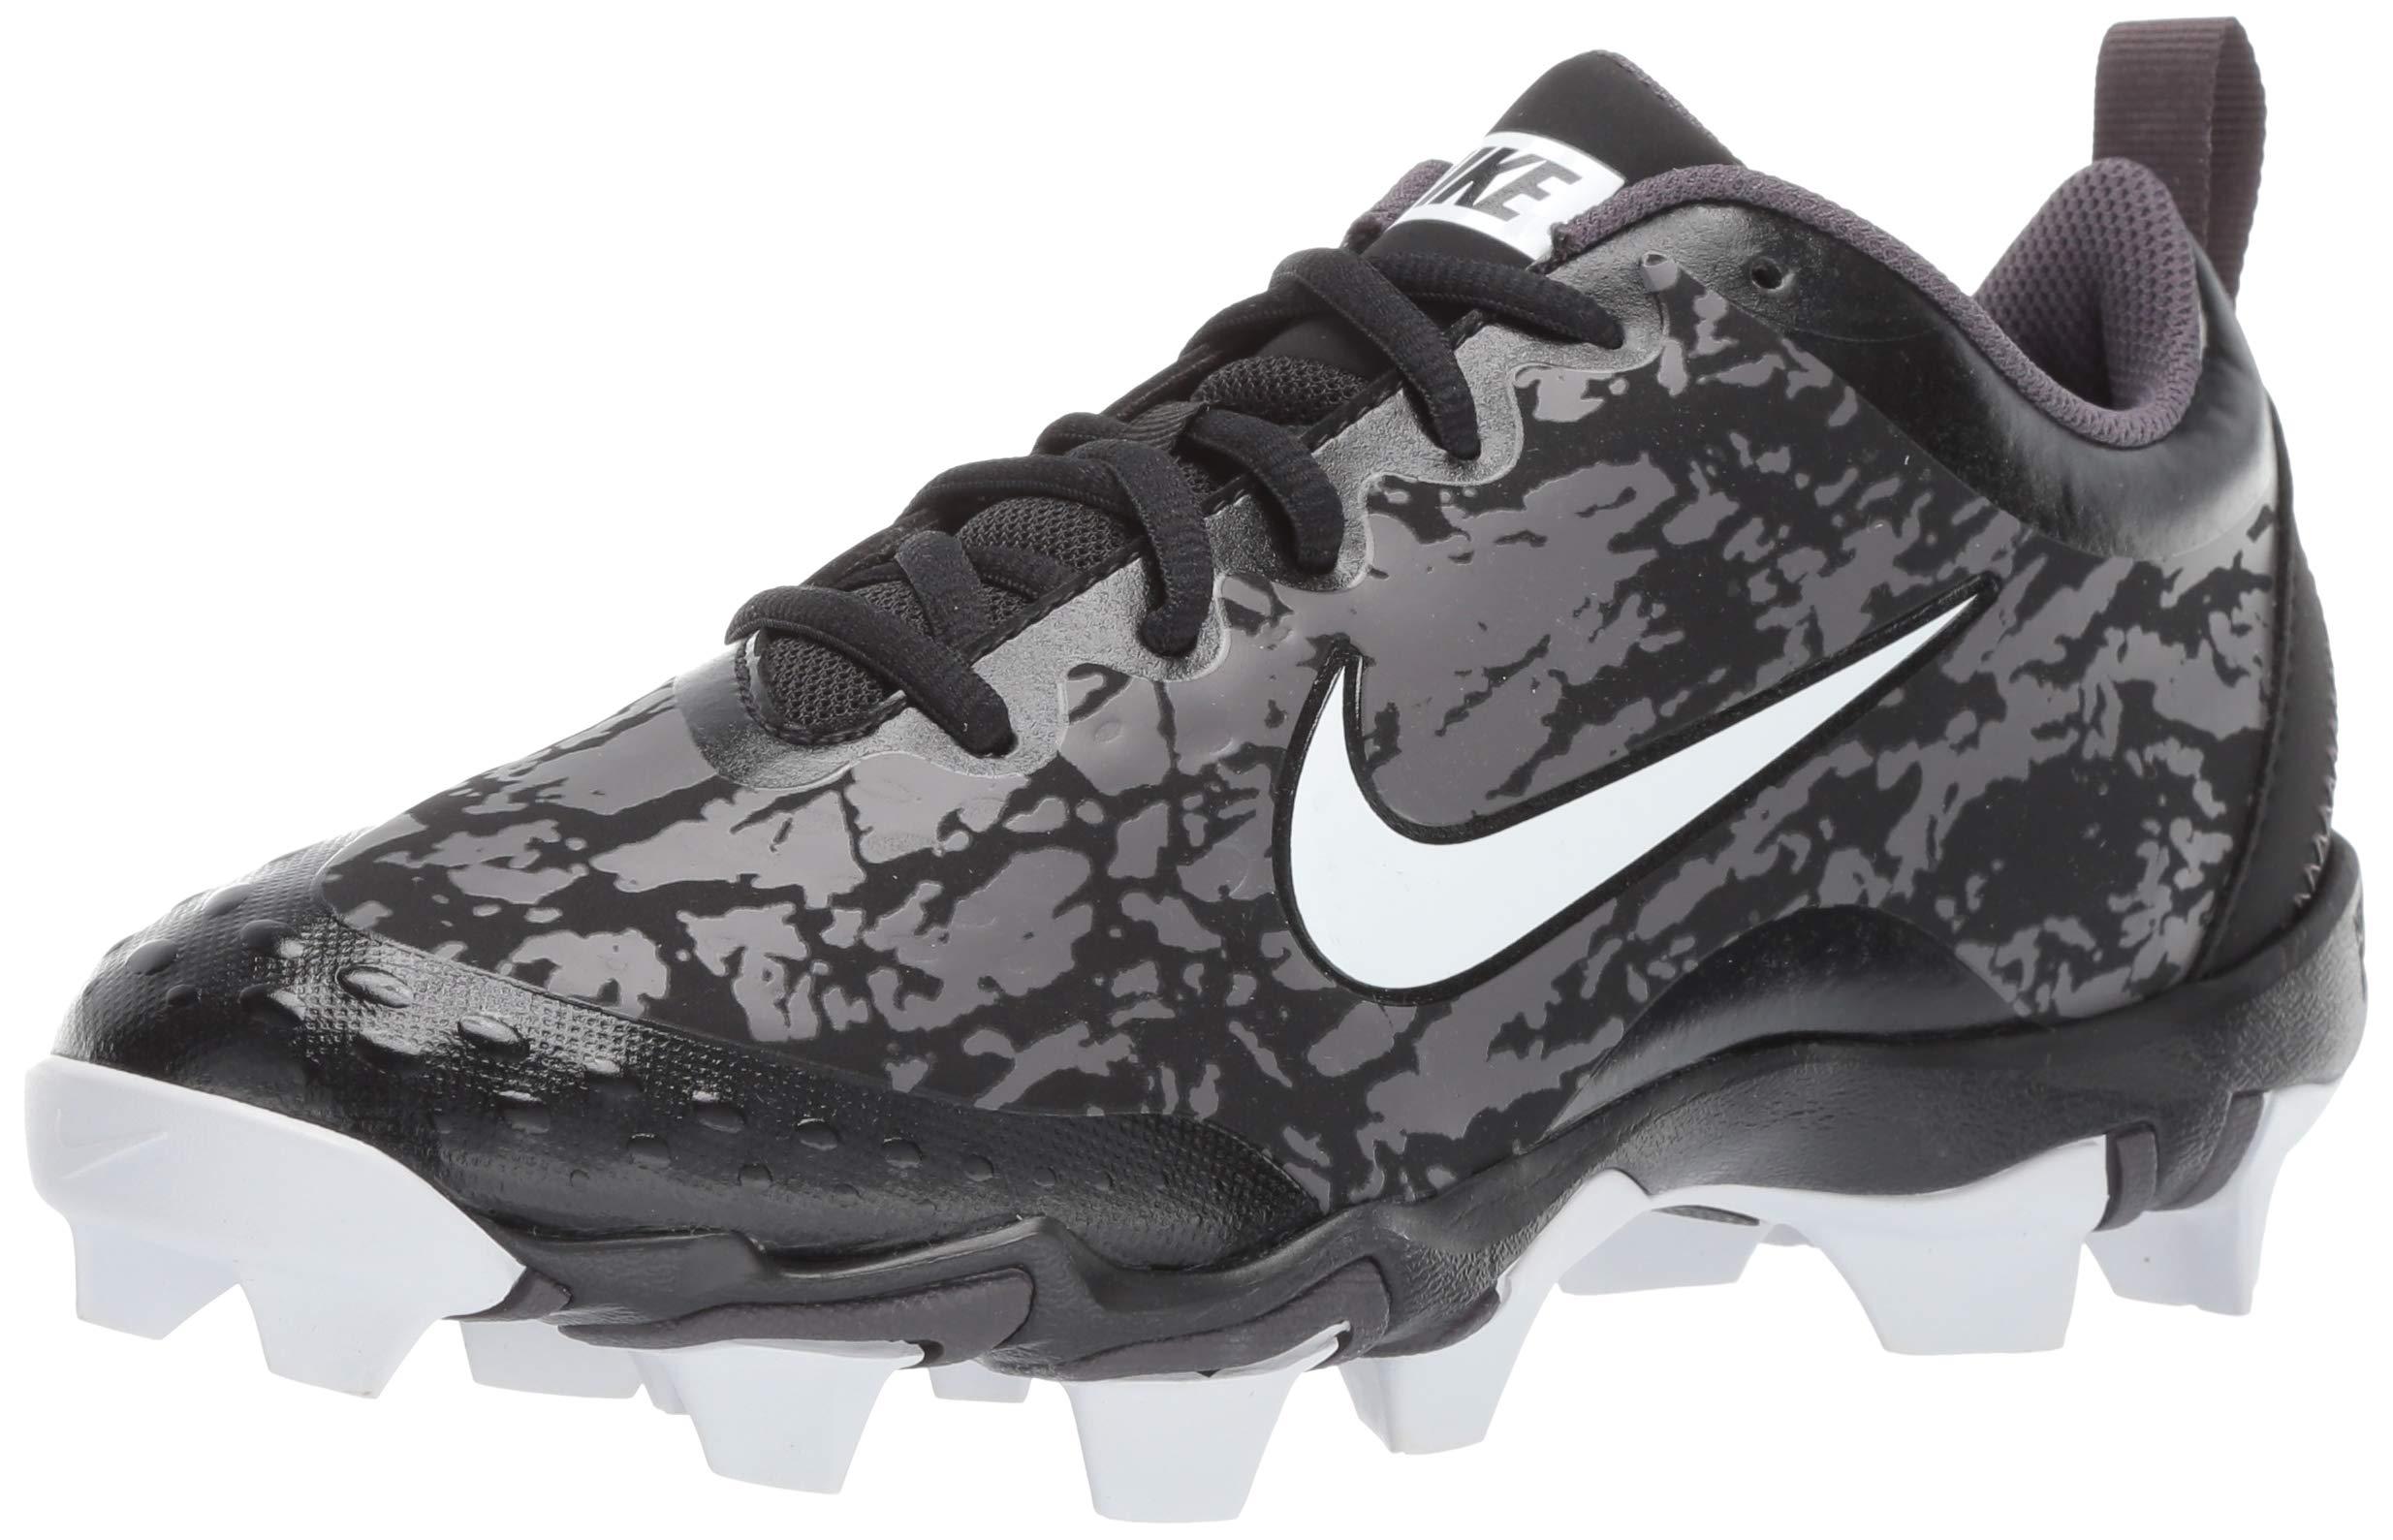 Nike Women's Hyperdiamond 2.5 Keystone Baseball Shoe, Black/White/Thunder Grey, 9 Regular US by Nike